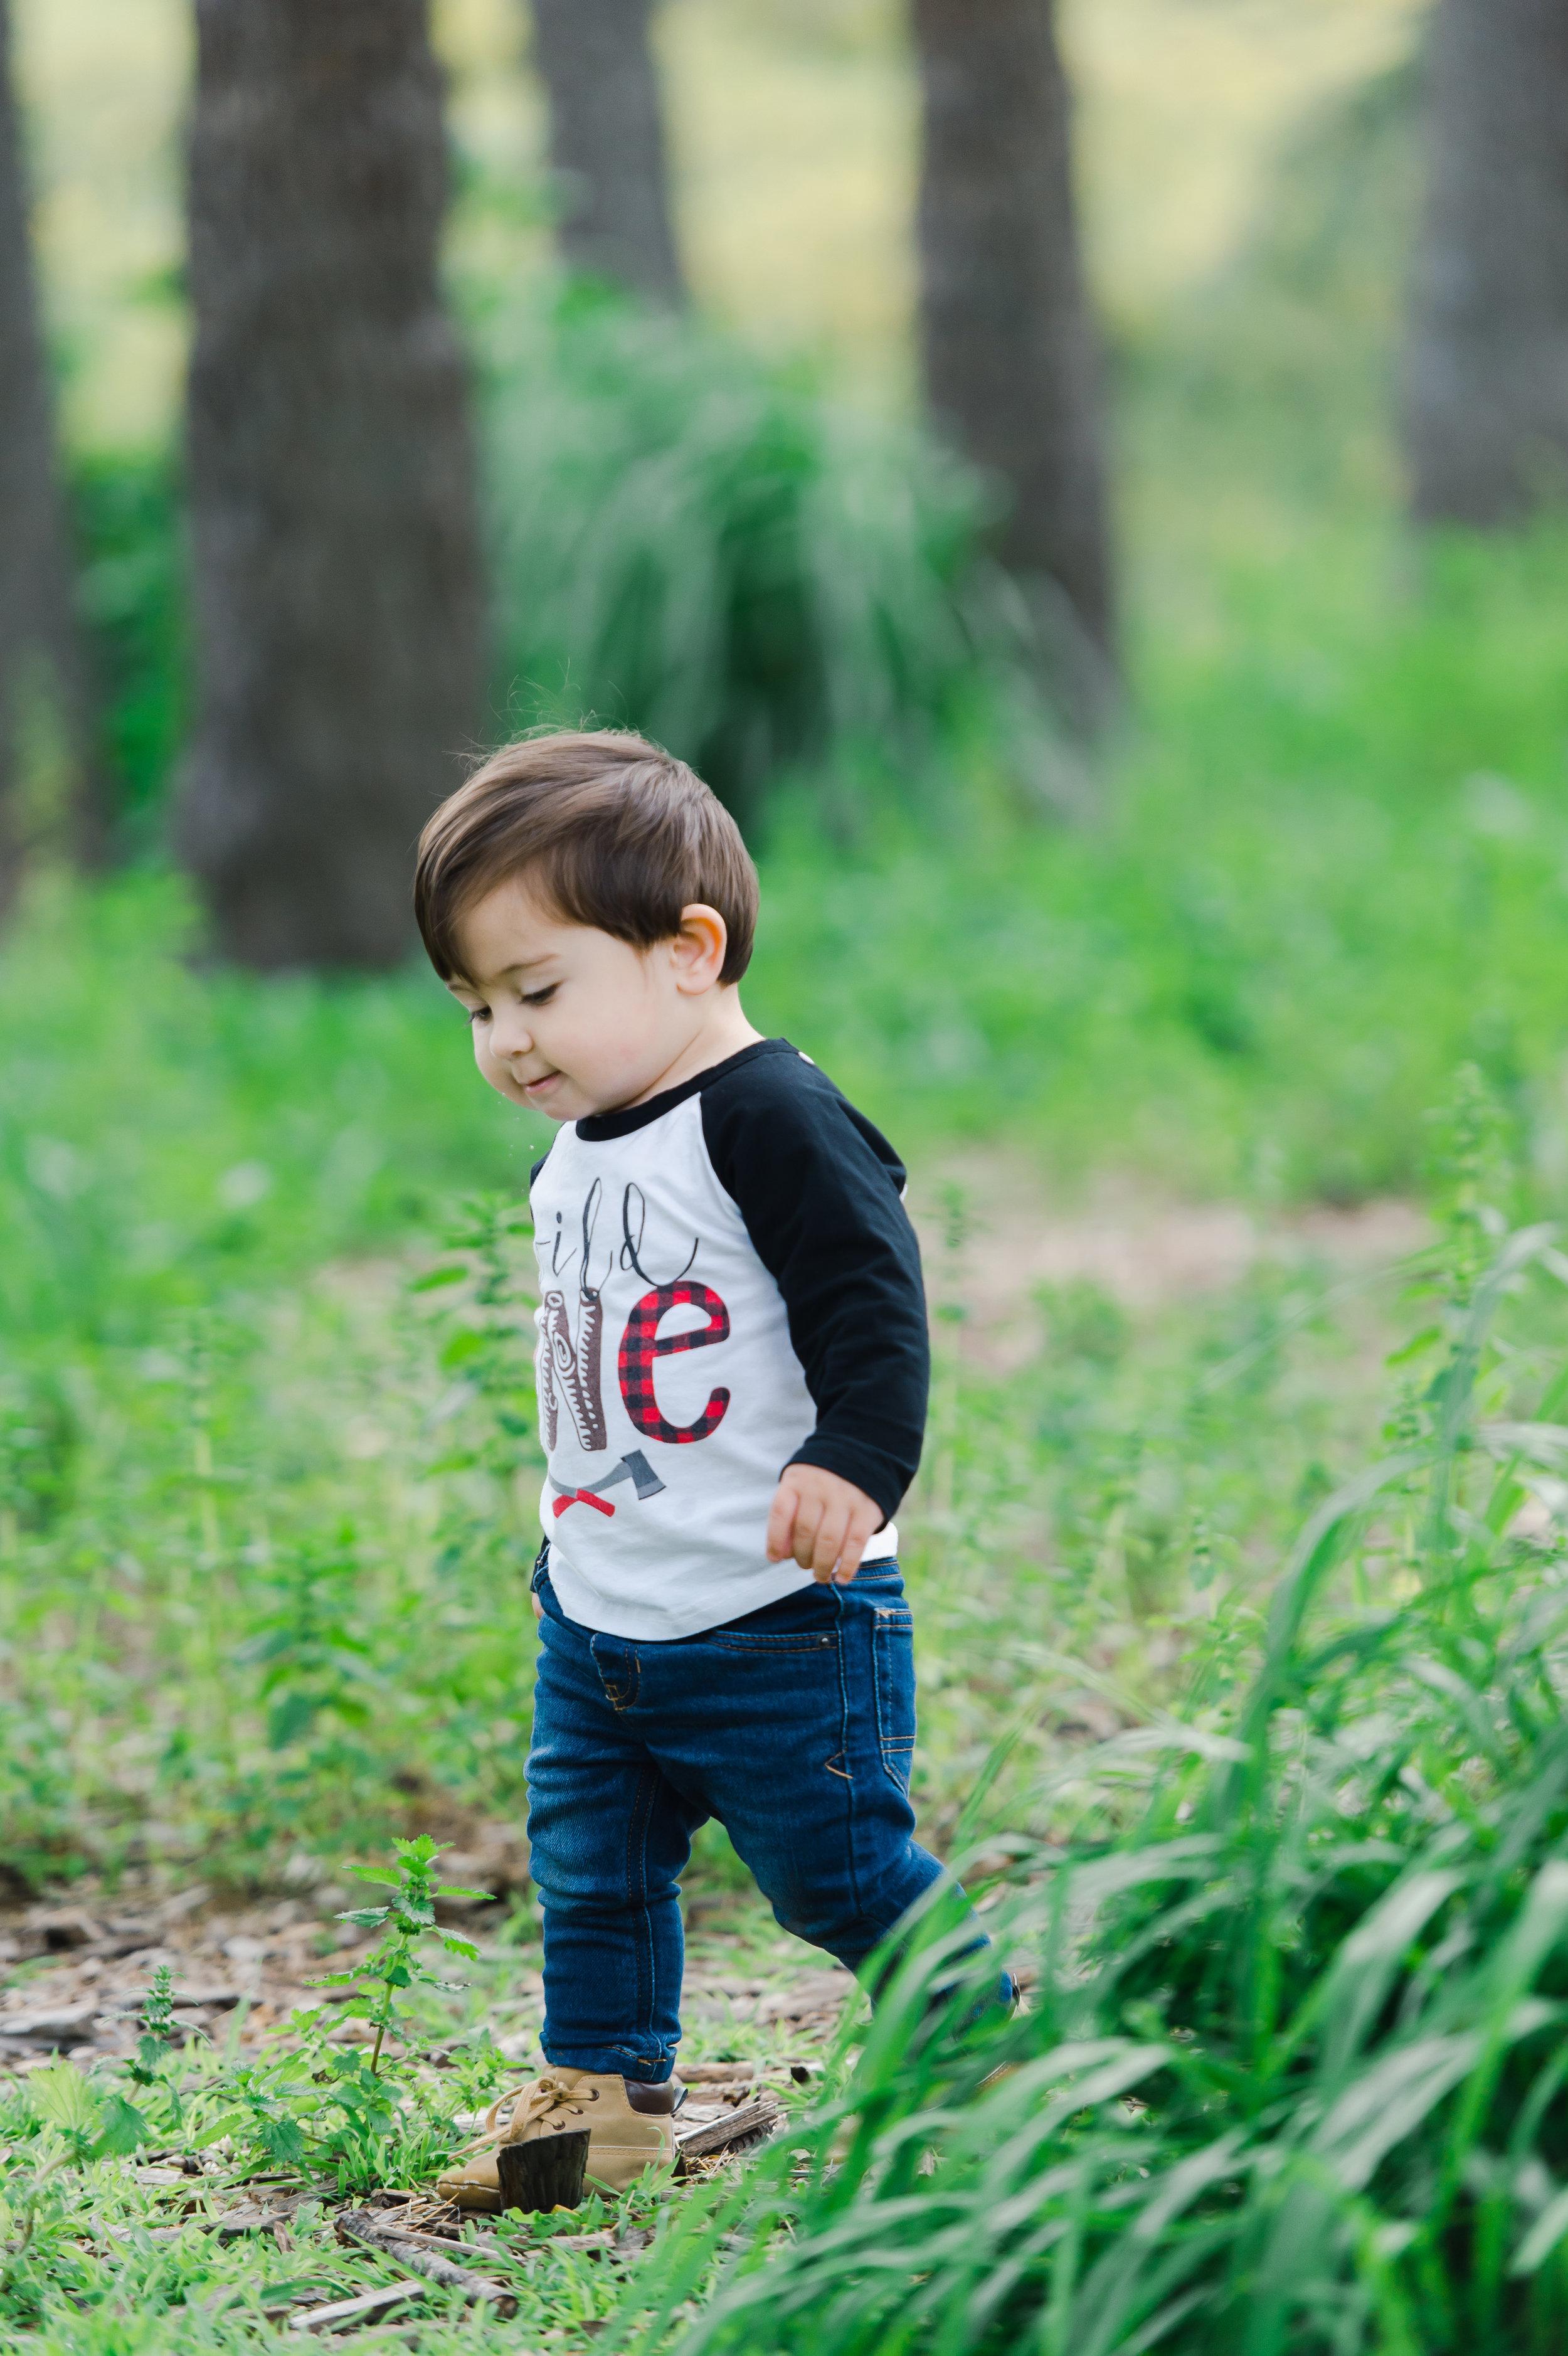 6cedargroveparkirvinefamilyphotos.jpg